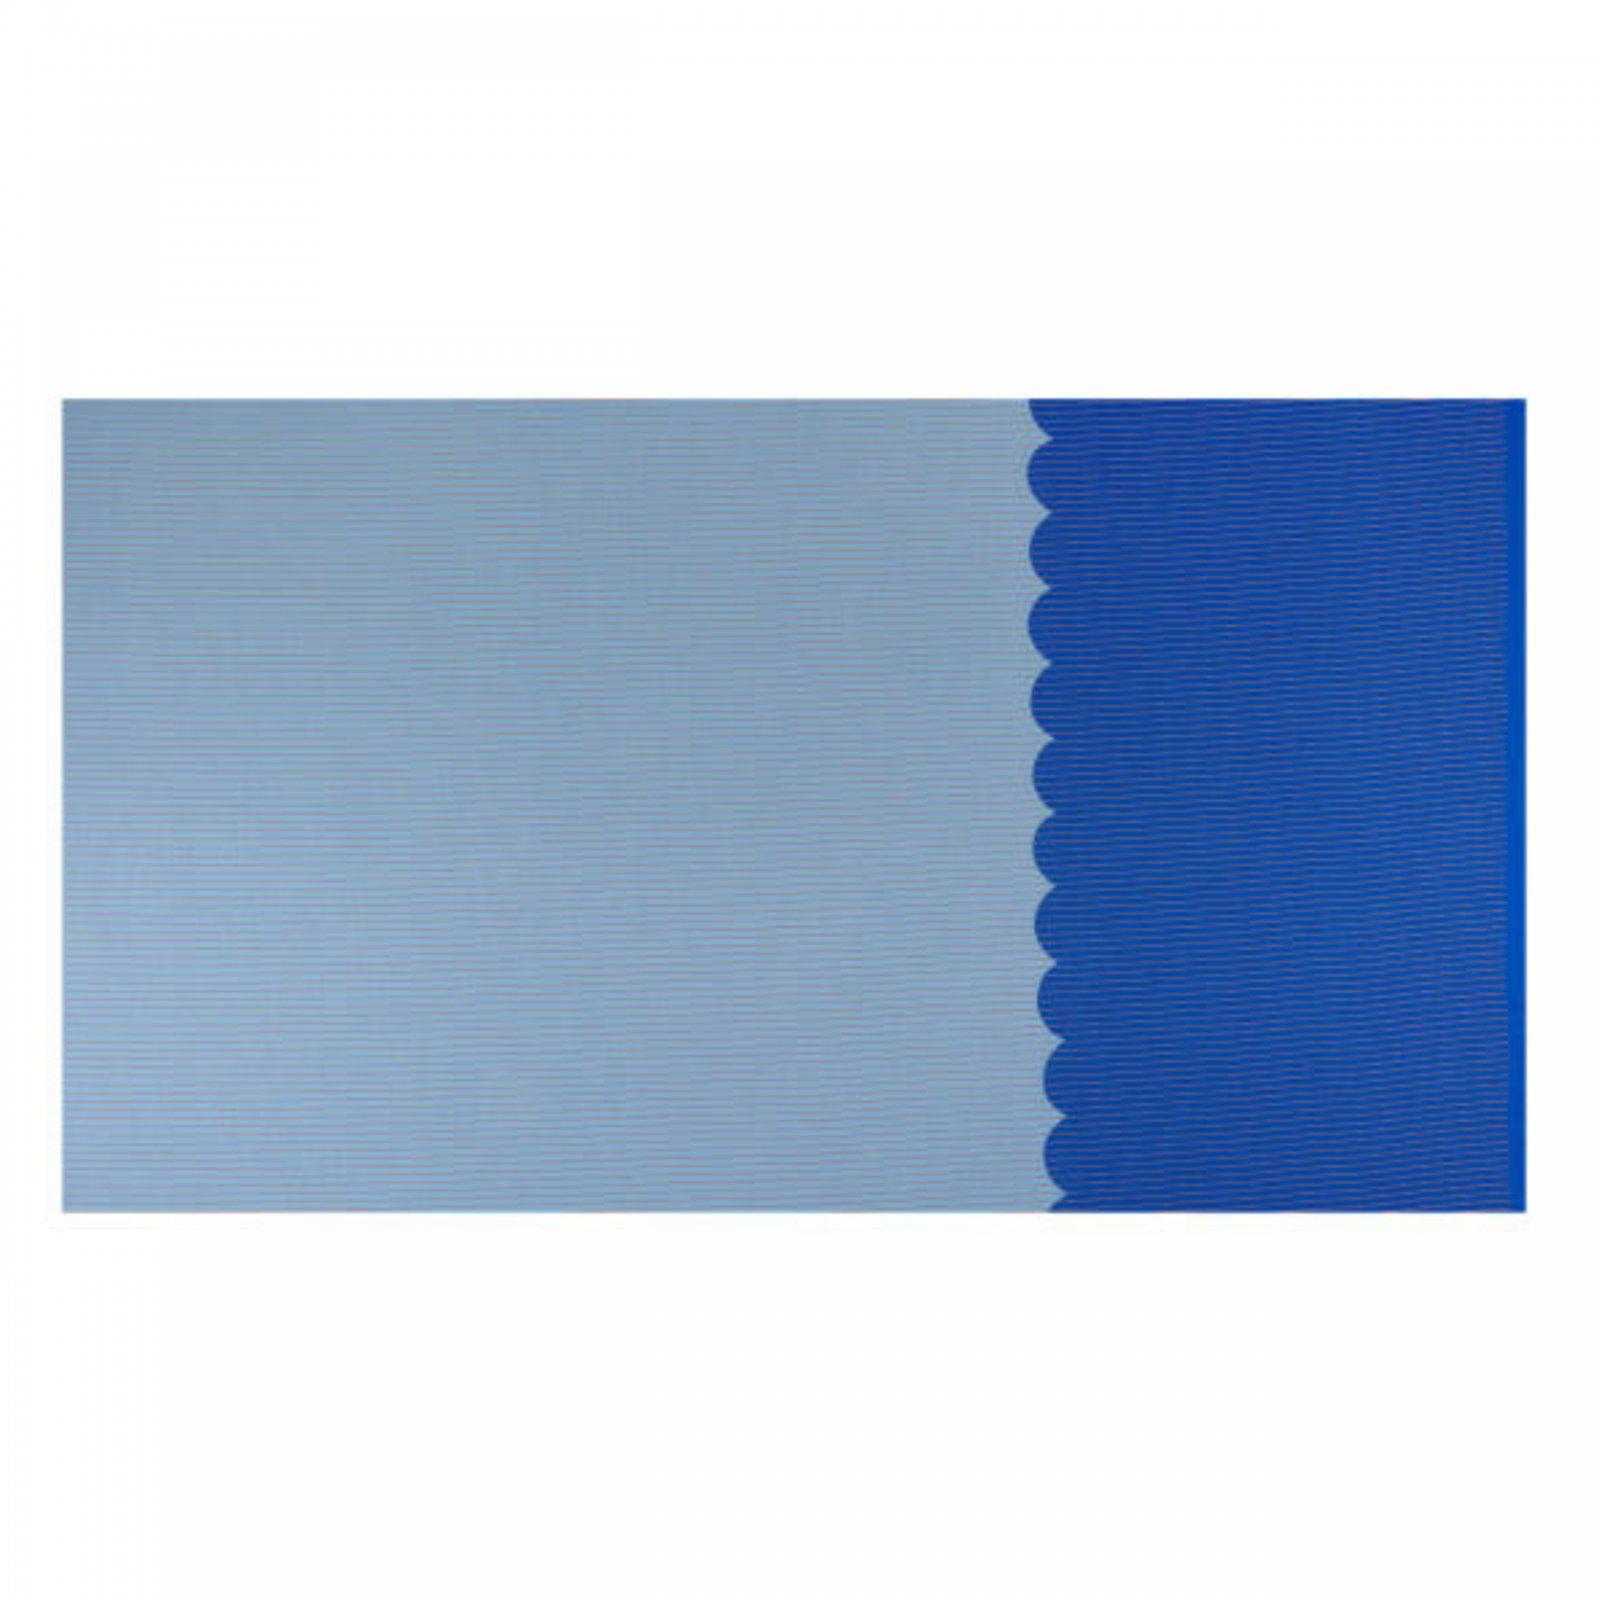 Harriot Stripe Cotton - Blueprint